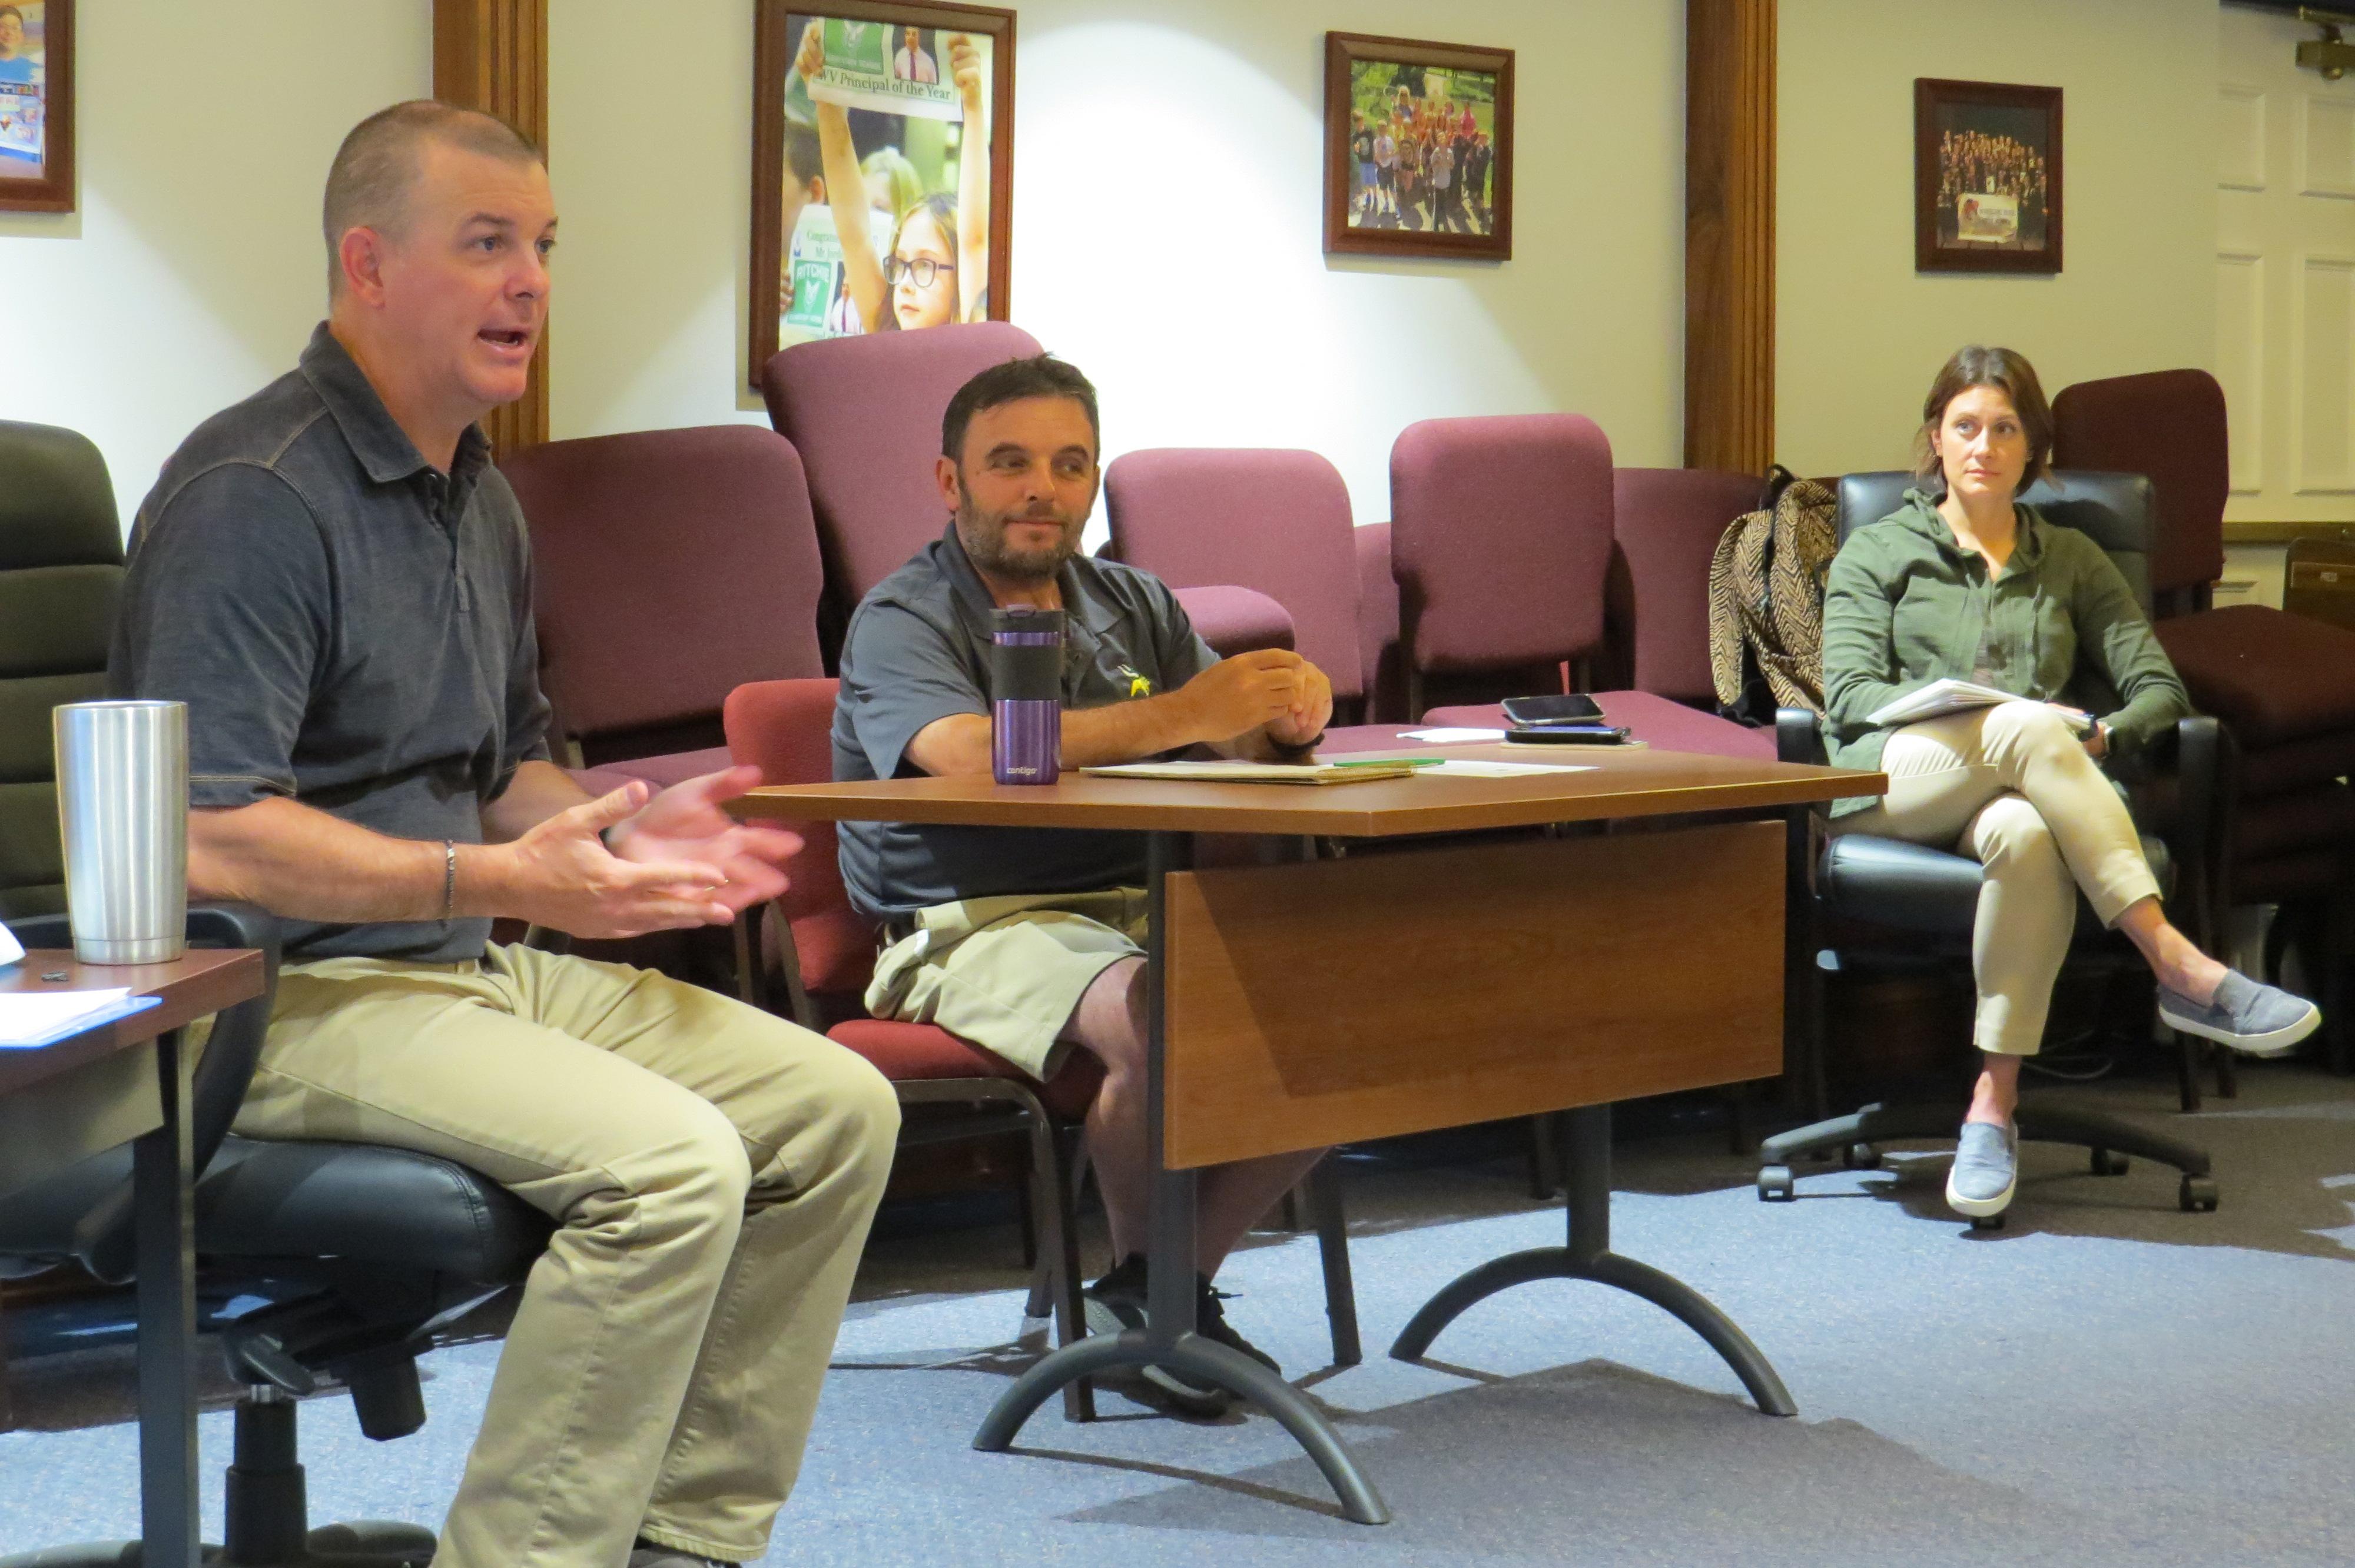 Ohio County Schools/ Wheeling Park Hs Announce Re Entry With Ohio County Schools Calendar 2020 2021 Wheeling